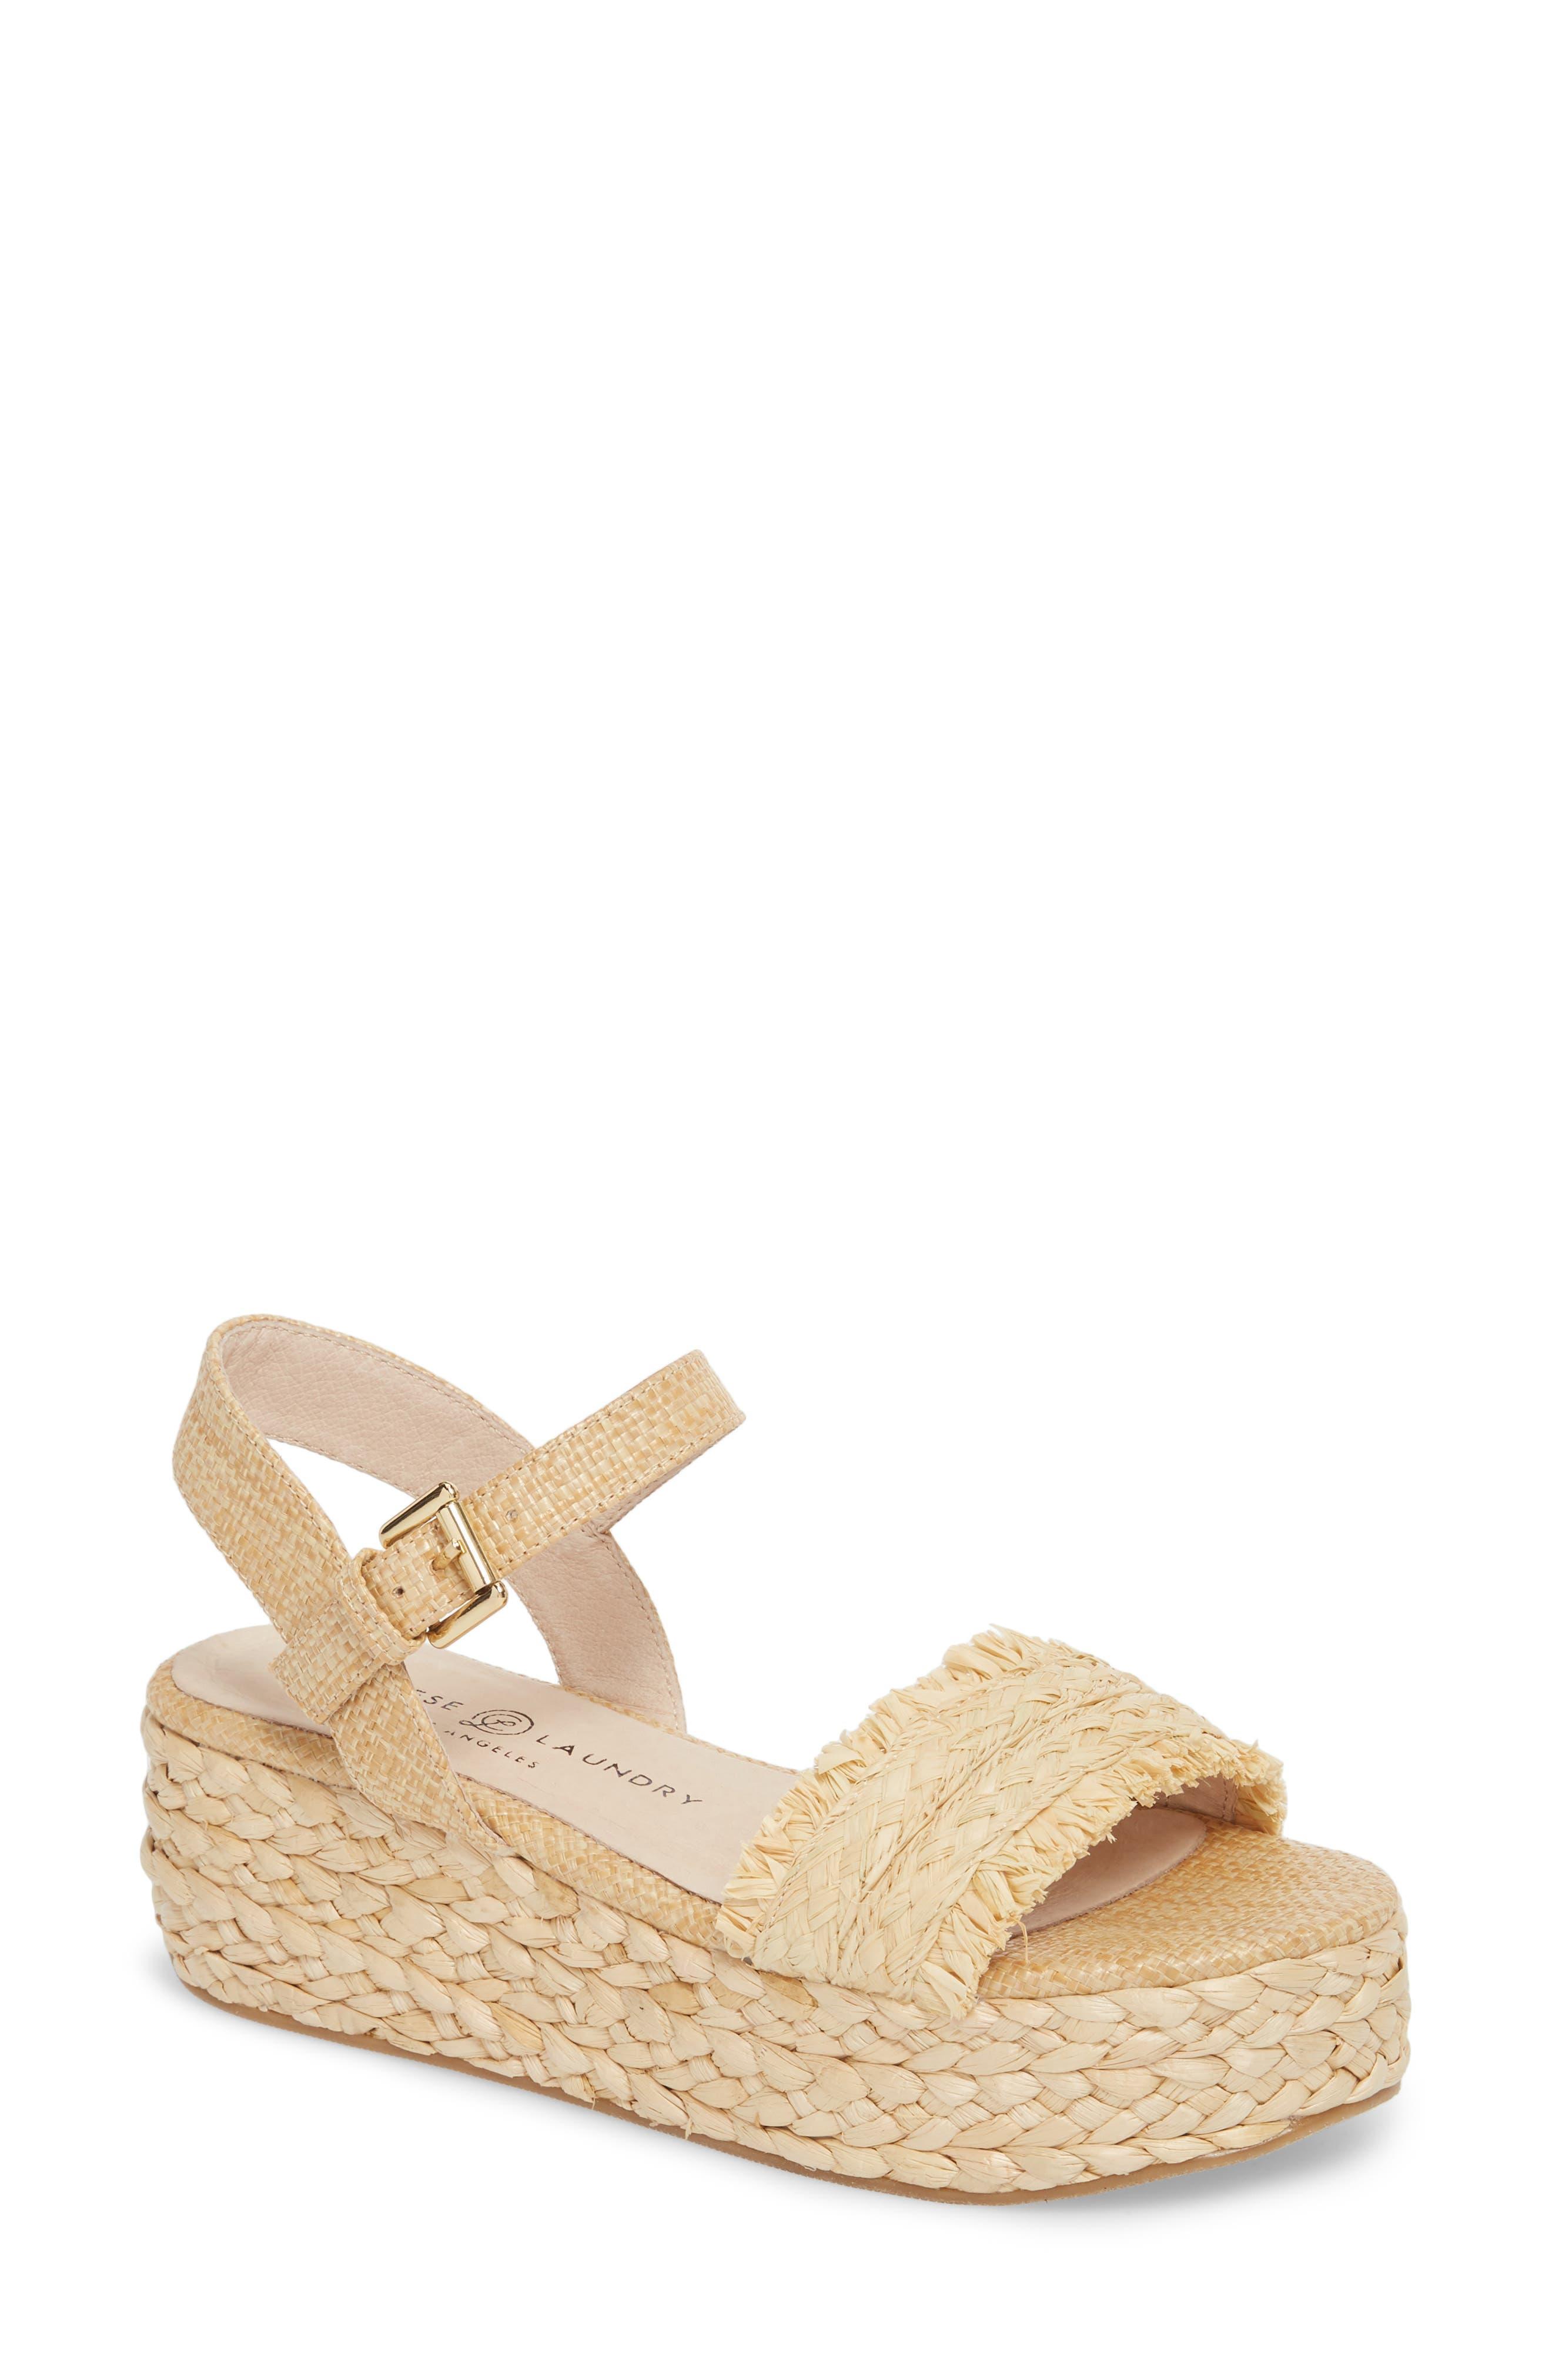 Zula Espadrille Sandal by Chinese Laundry